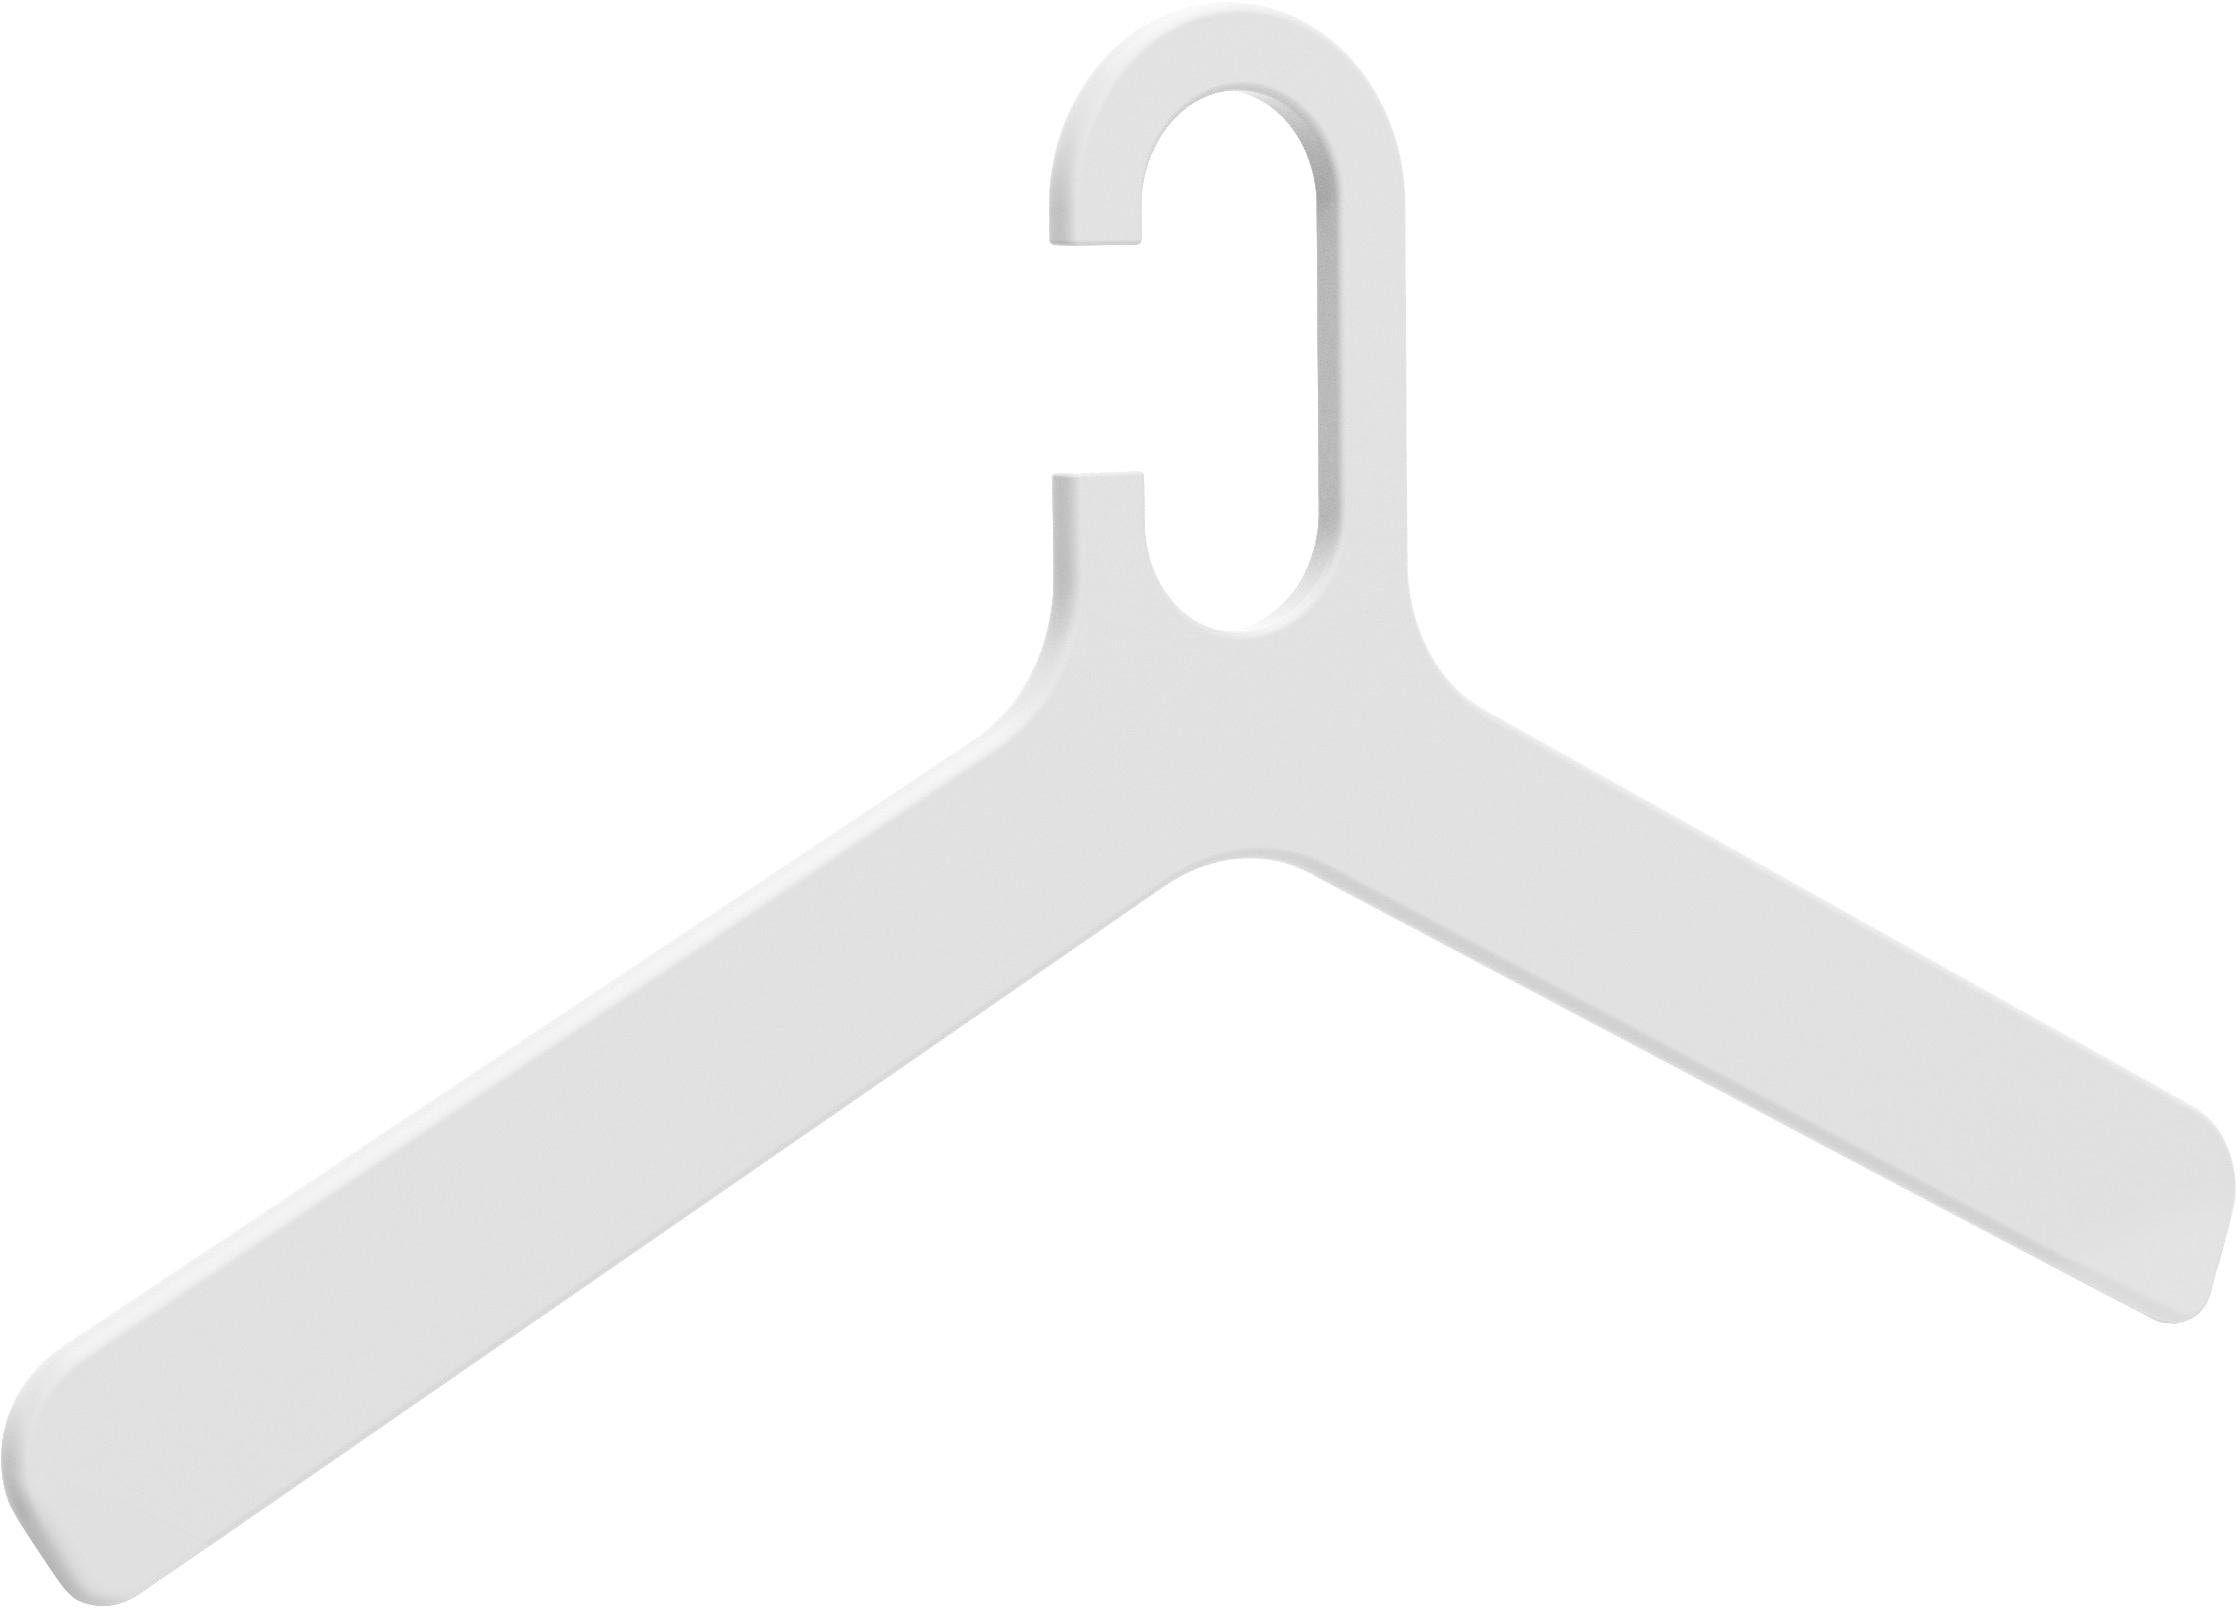 pieperconcept Kleiderbügel Grado, (Set, 3-tlg.) | Flur & Diele > Garderoben | Pieperconcept